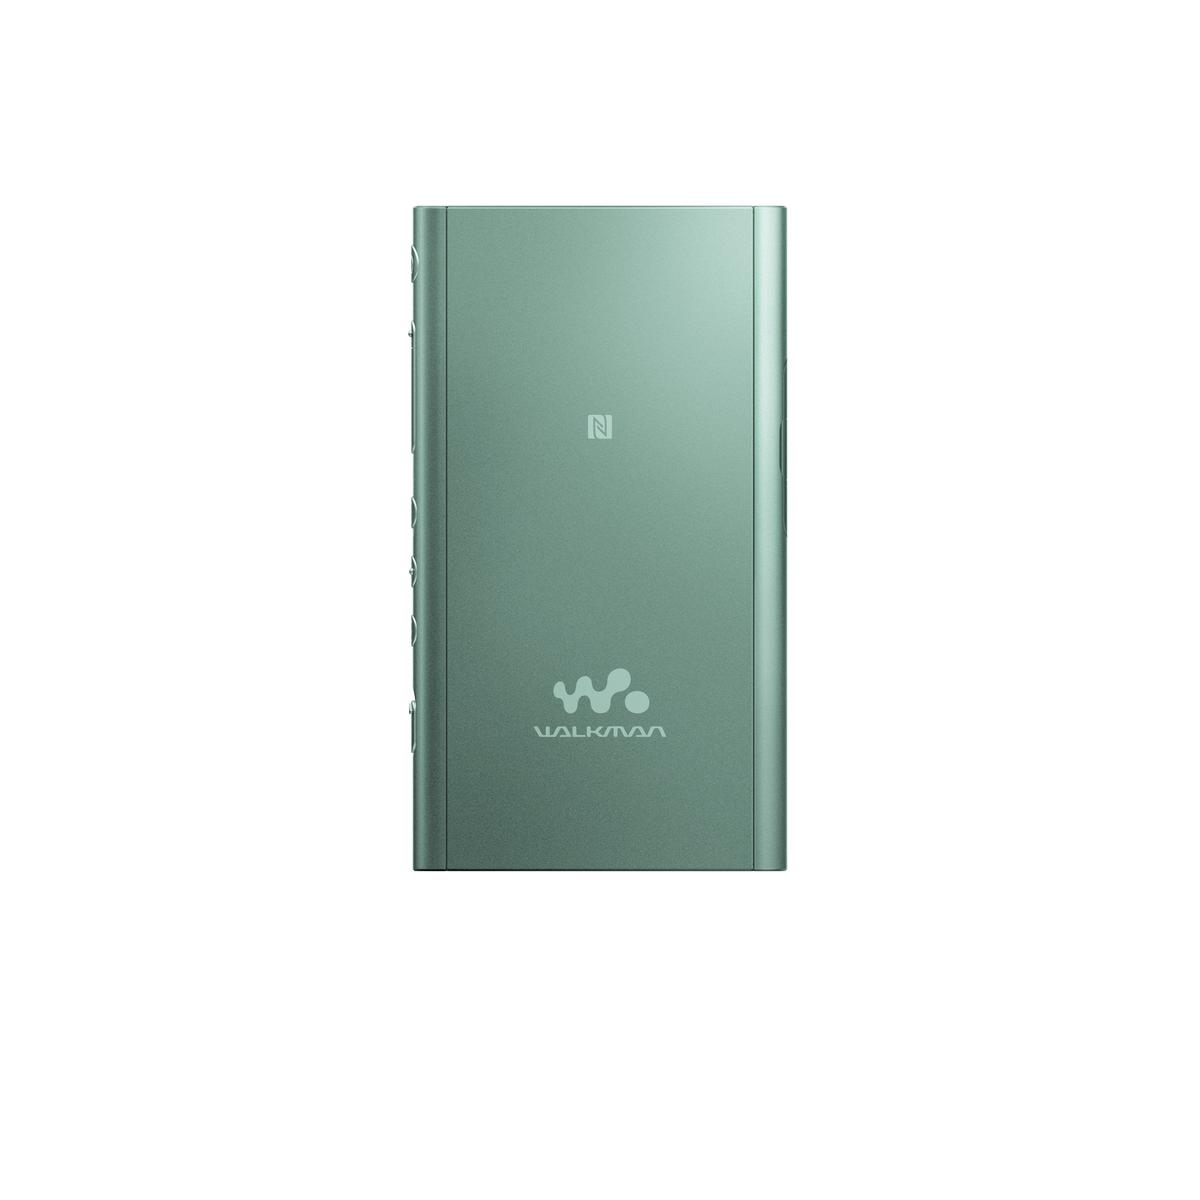 Sony Walkman NW-A55 зелёный купить в Sony Centre Воронеж